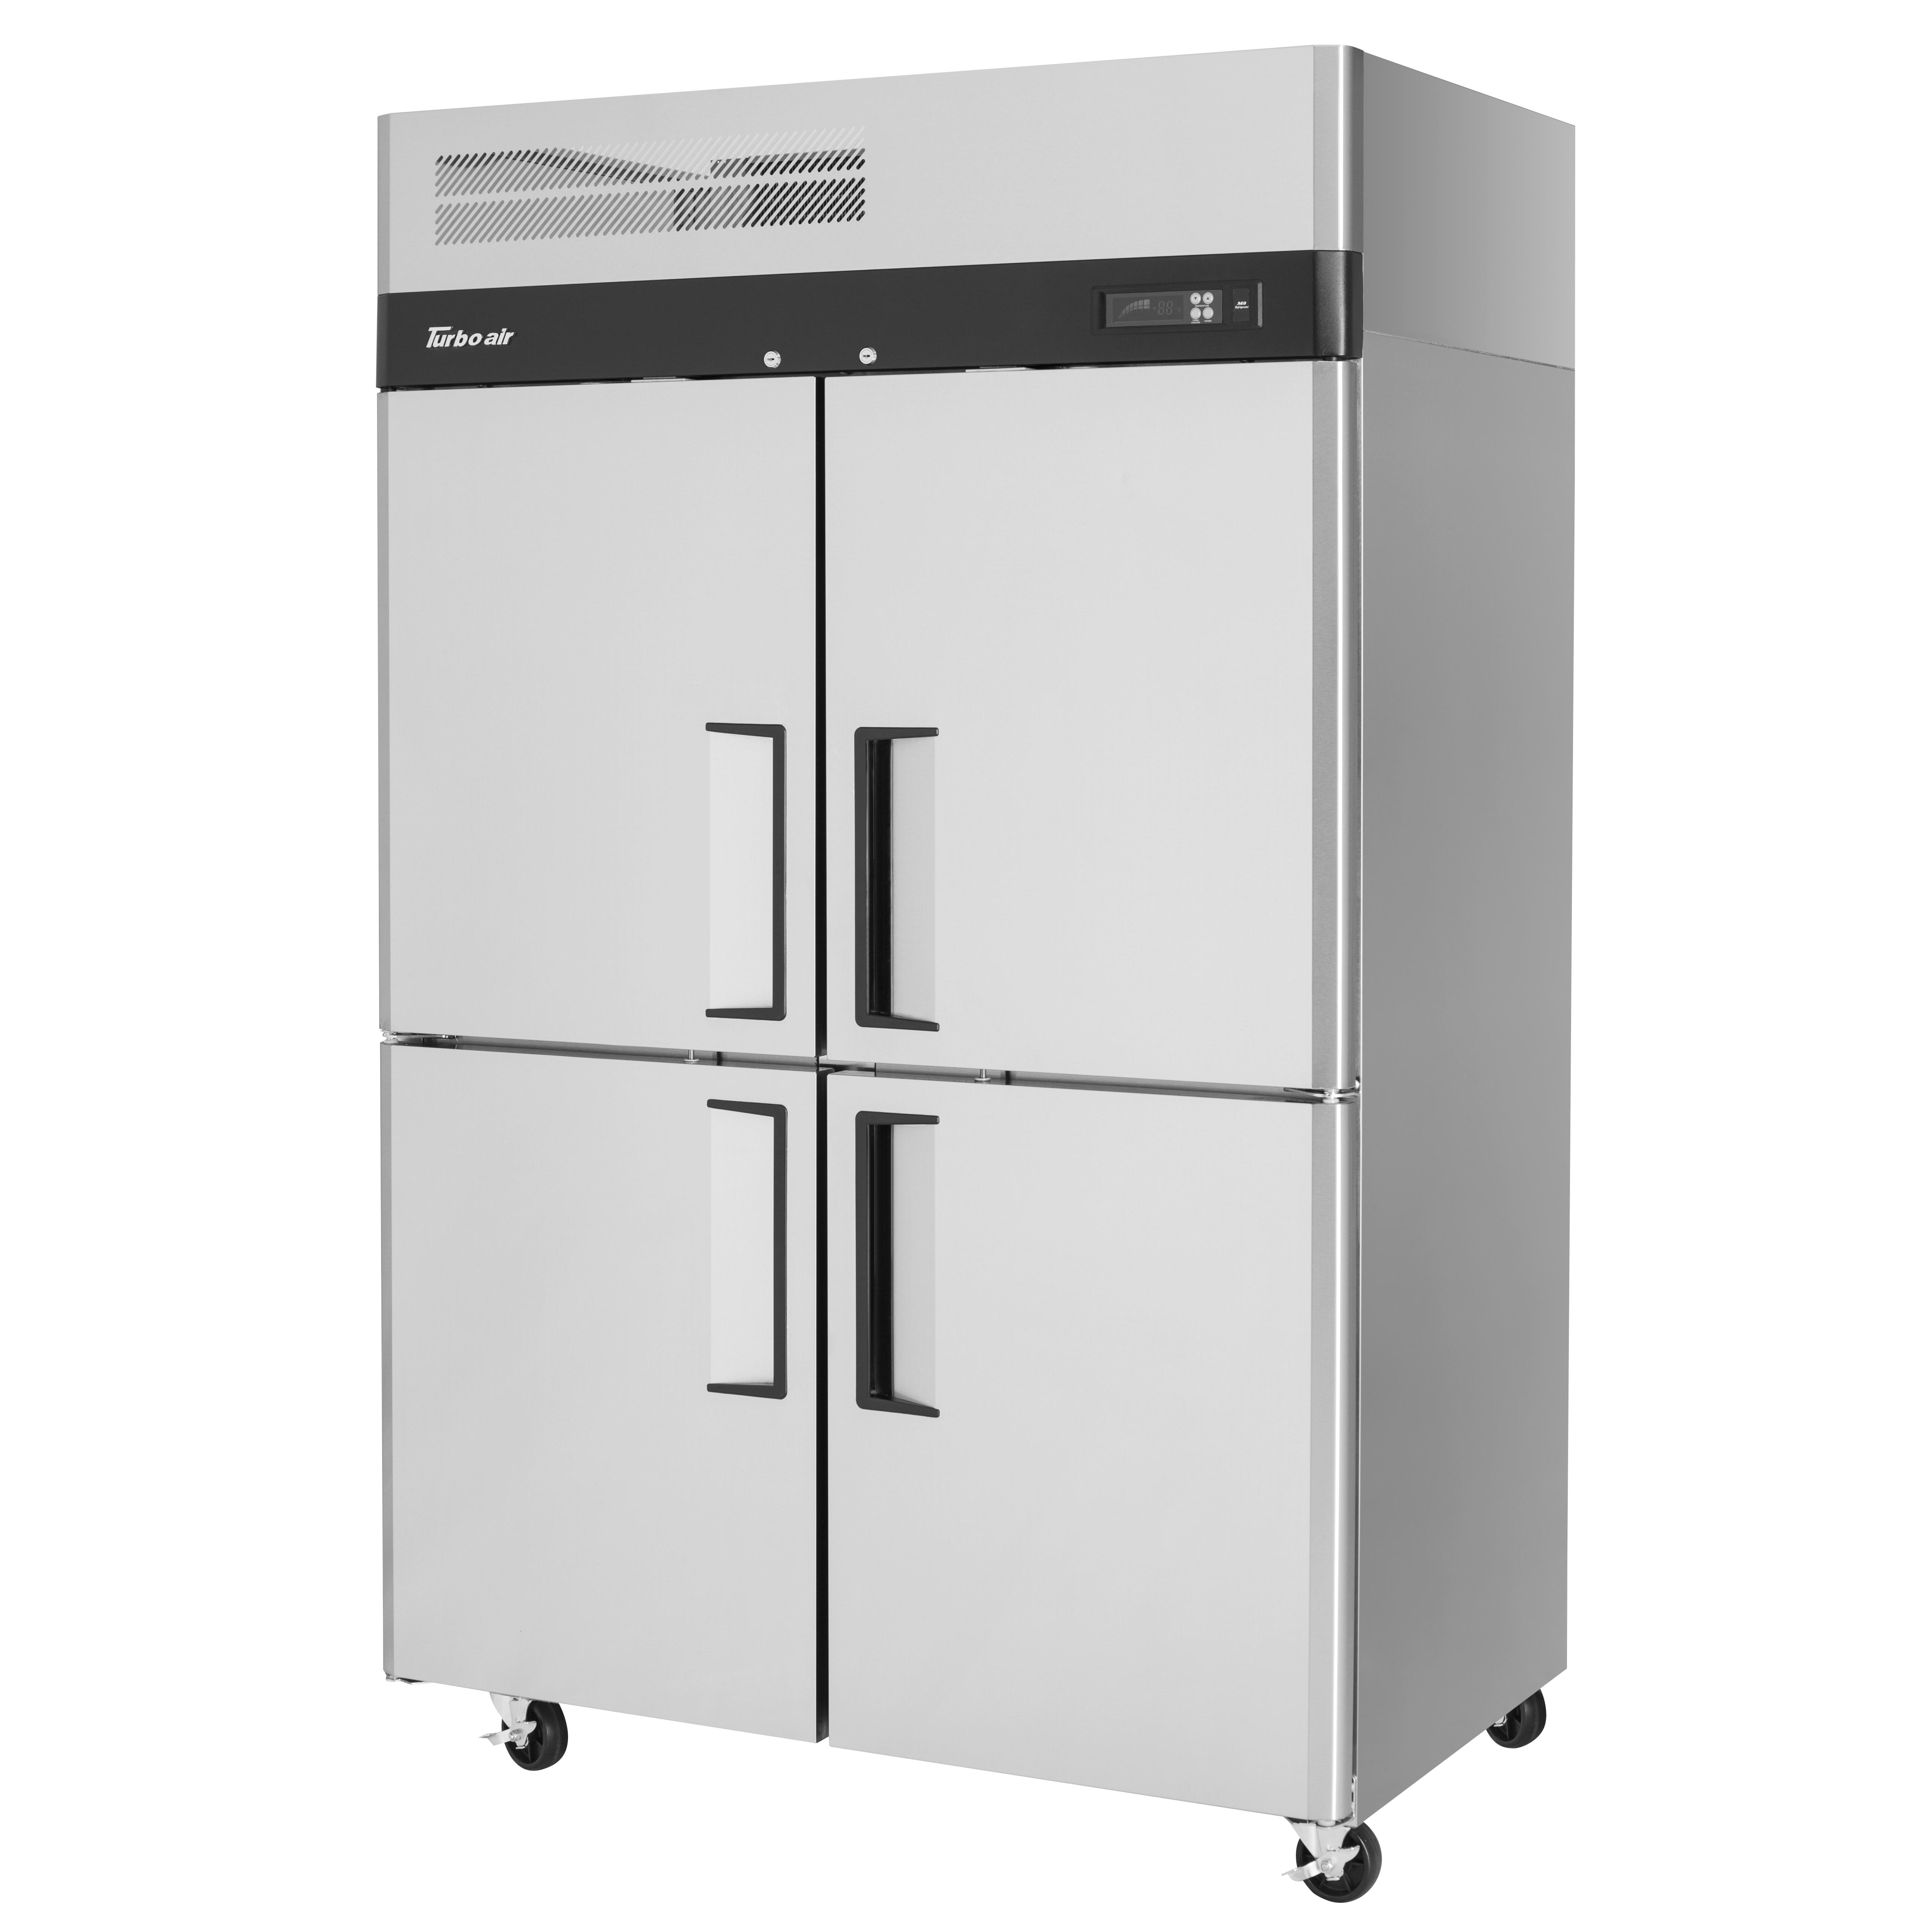 Turbo Air M3R47-4-N refrigerator, reach-in